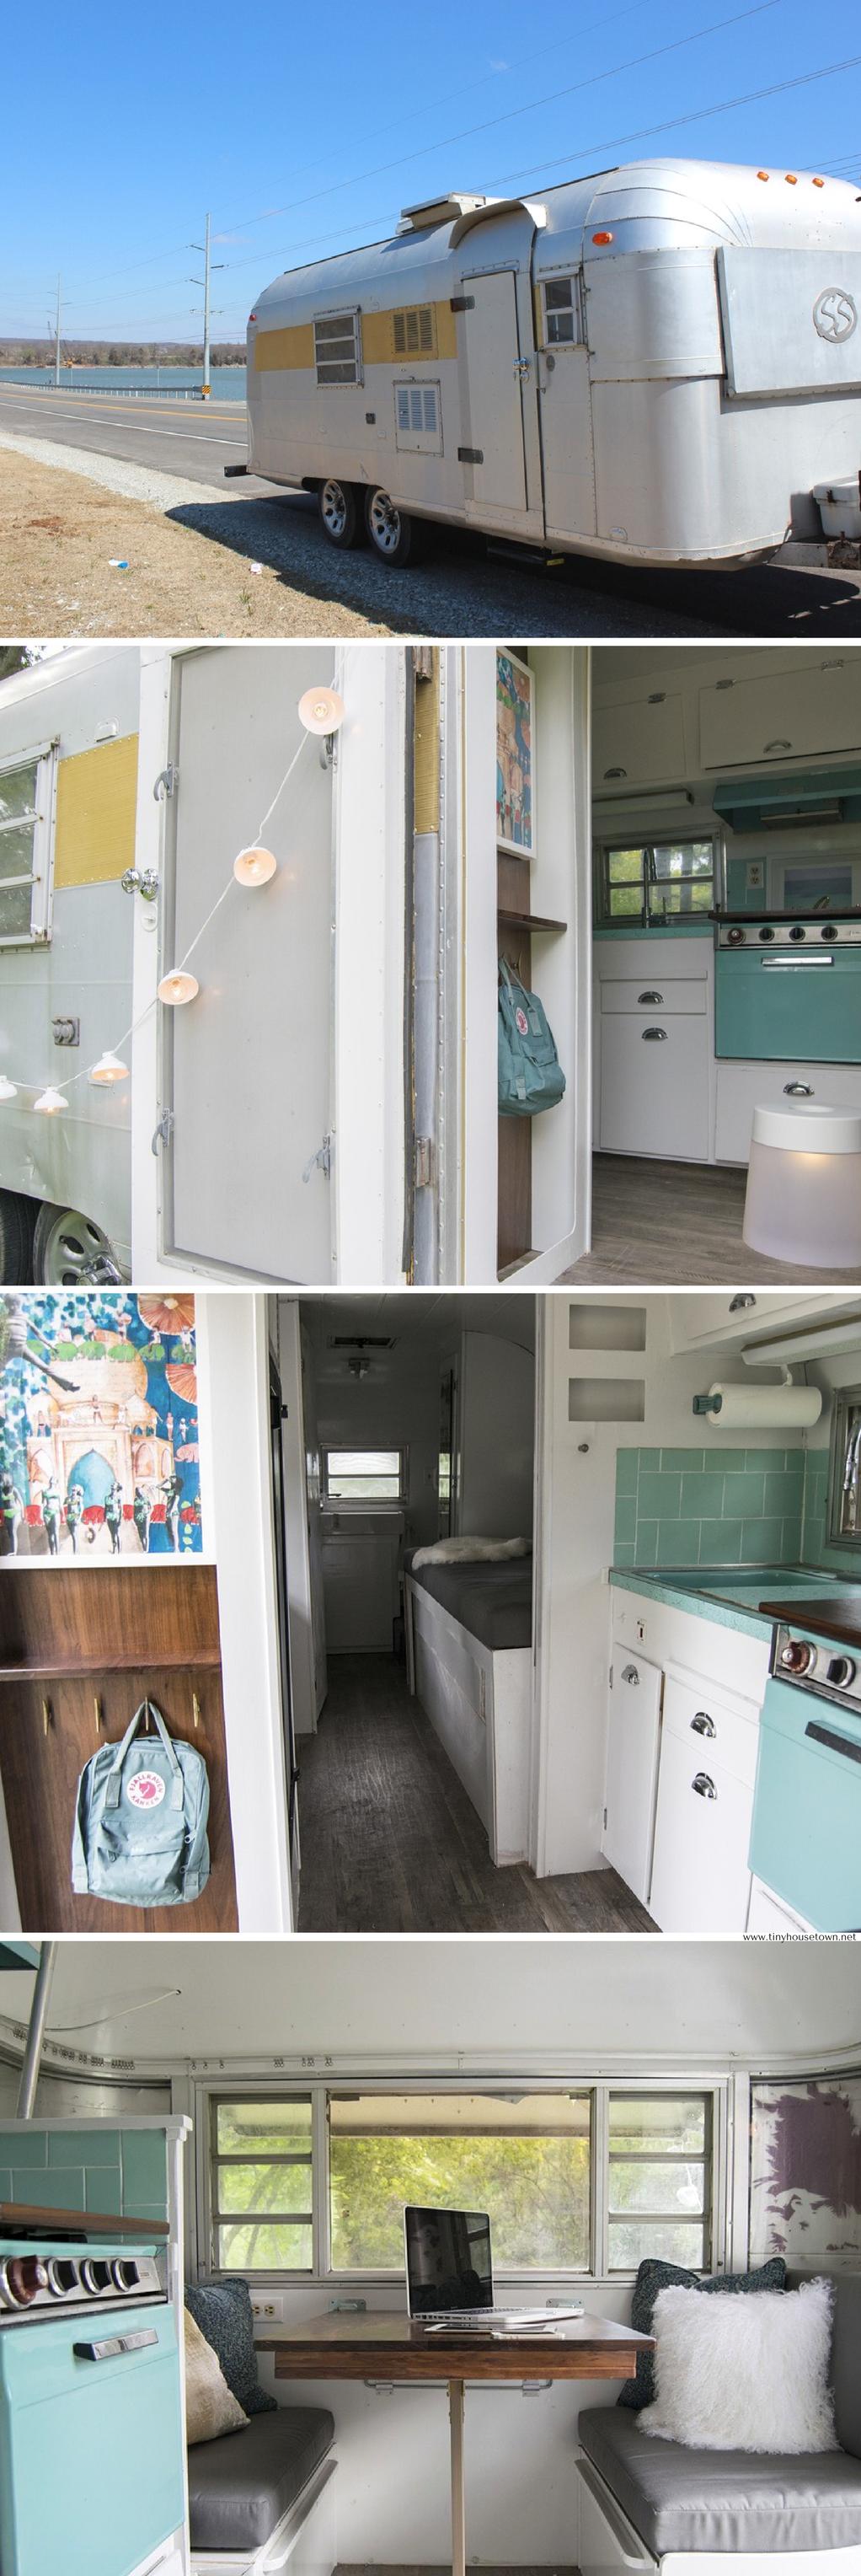 kitchen remodel okc A Silver Streak trailer for sale in Oklahoma City